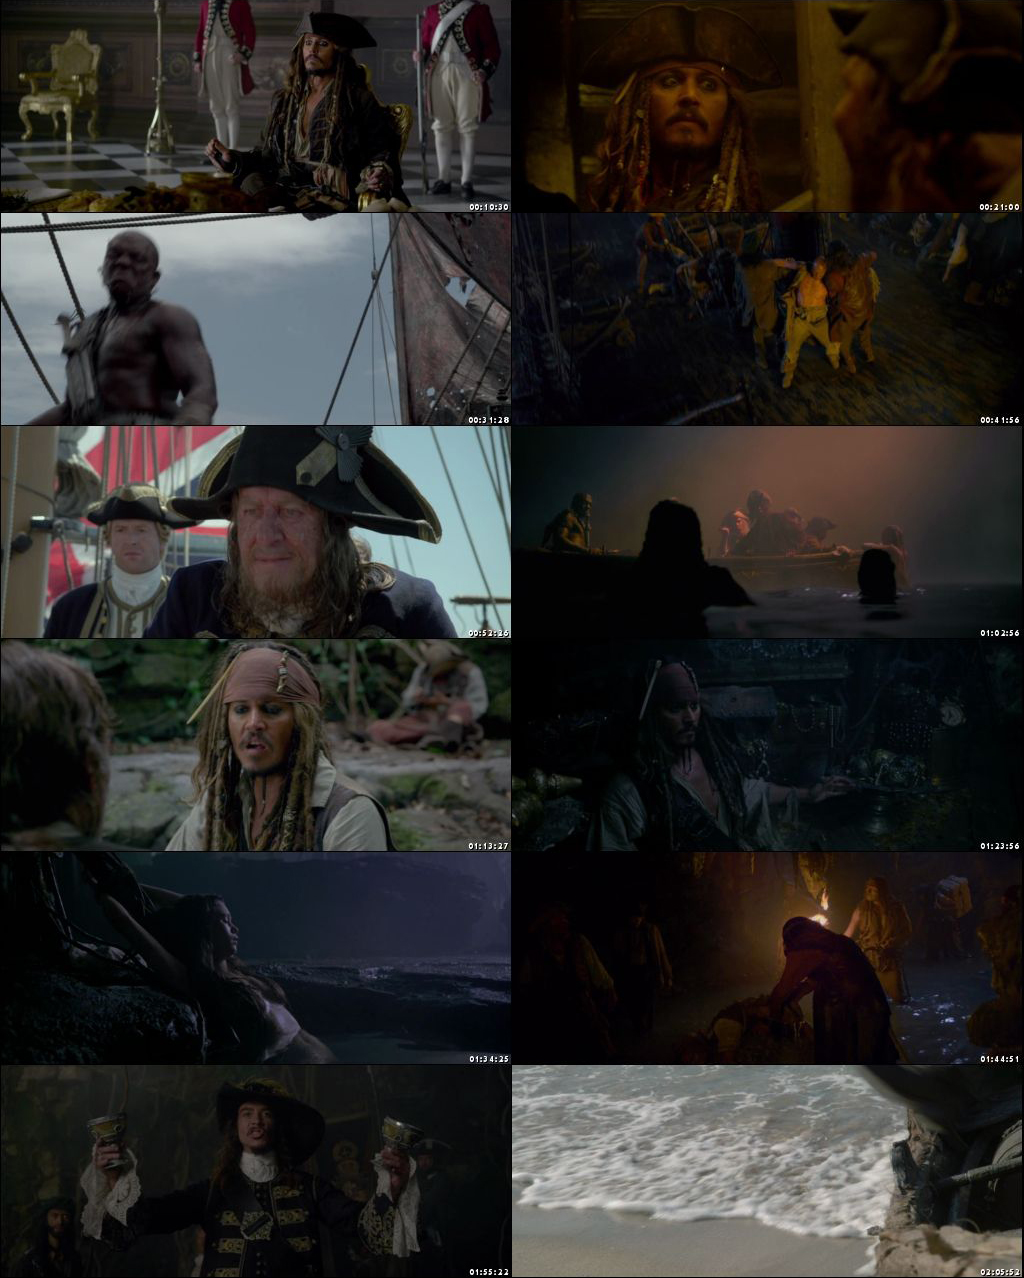 Pirates of the Caribbean On Stranger Tides 2011 Hindi Dual Audio 480p 720p 1080p HD BRRip ESub